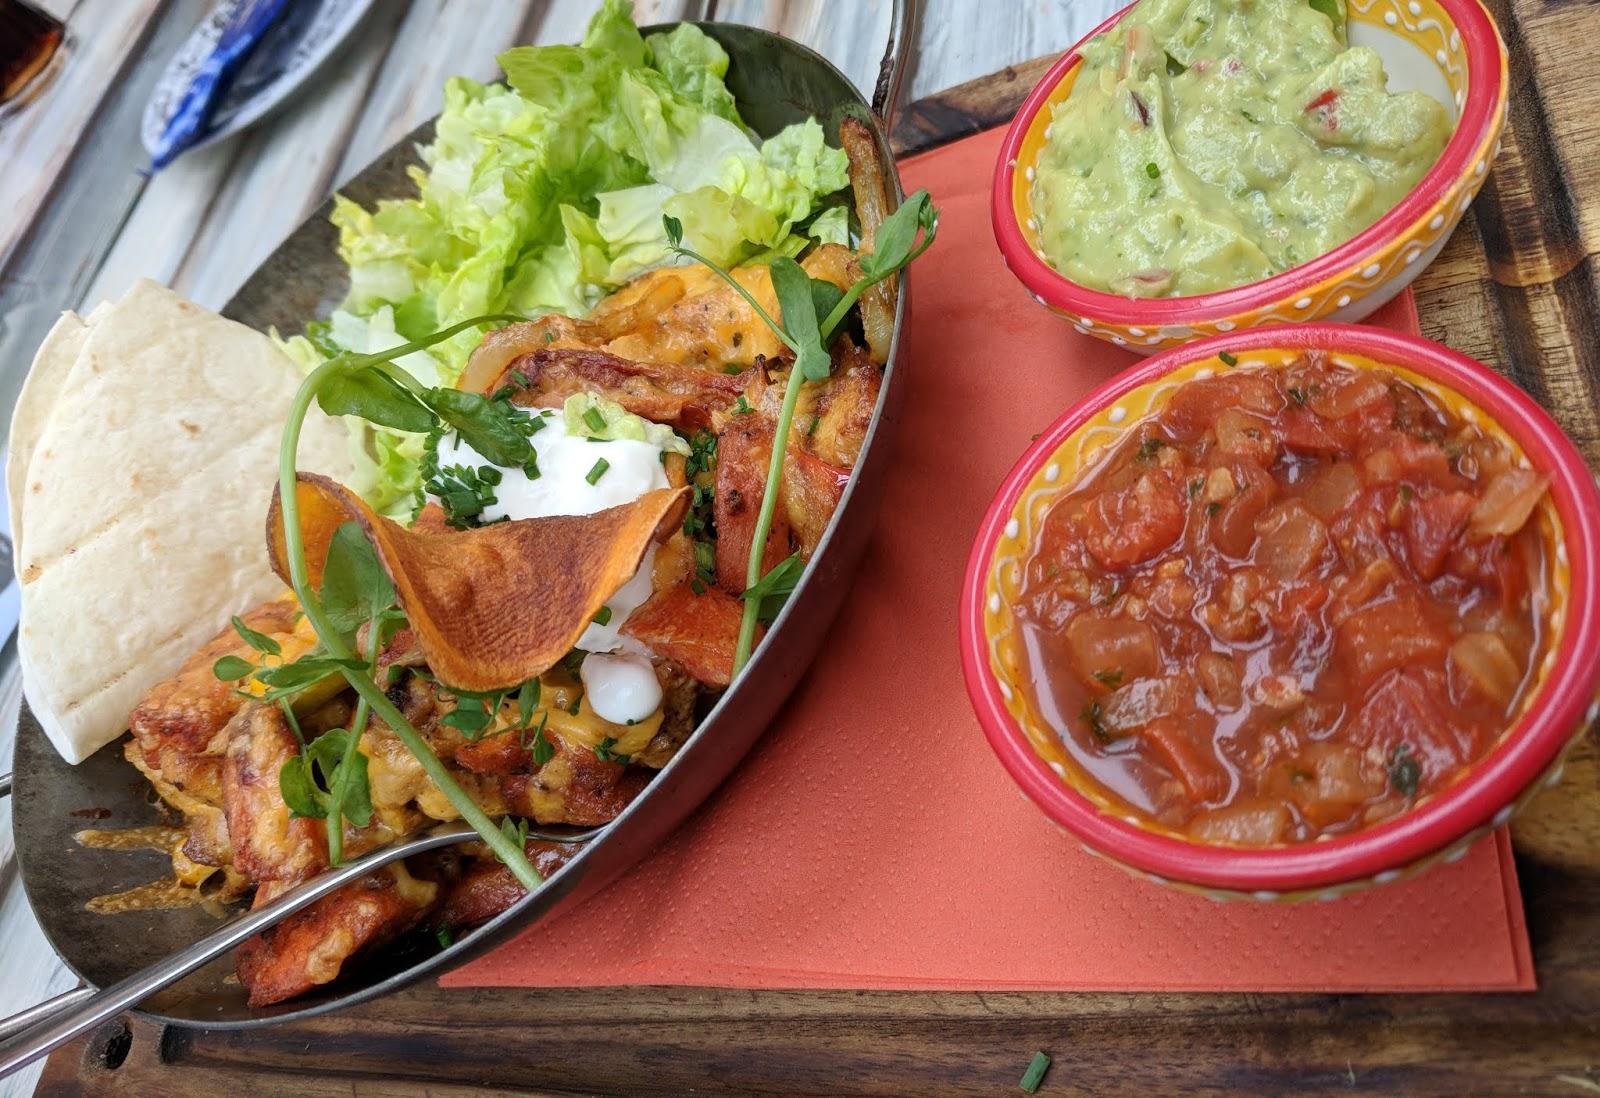 Fajitas from Pops American Diner in Wassenaar